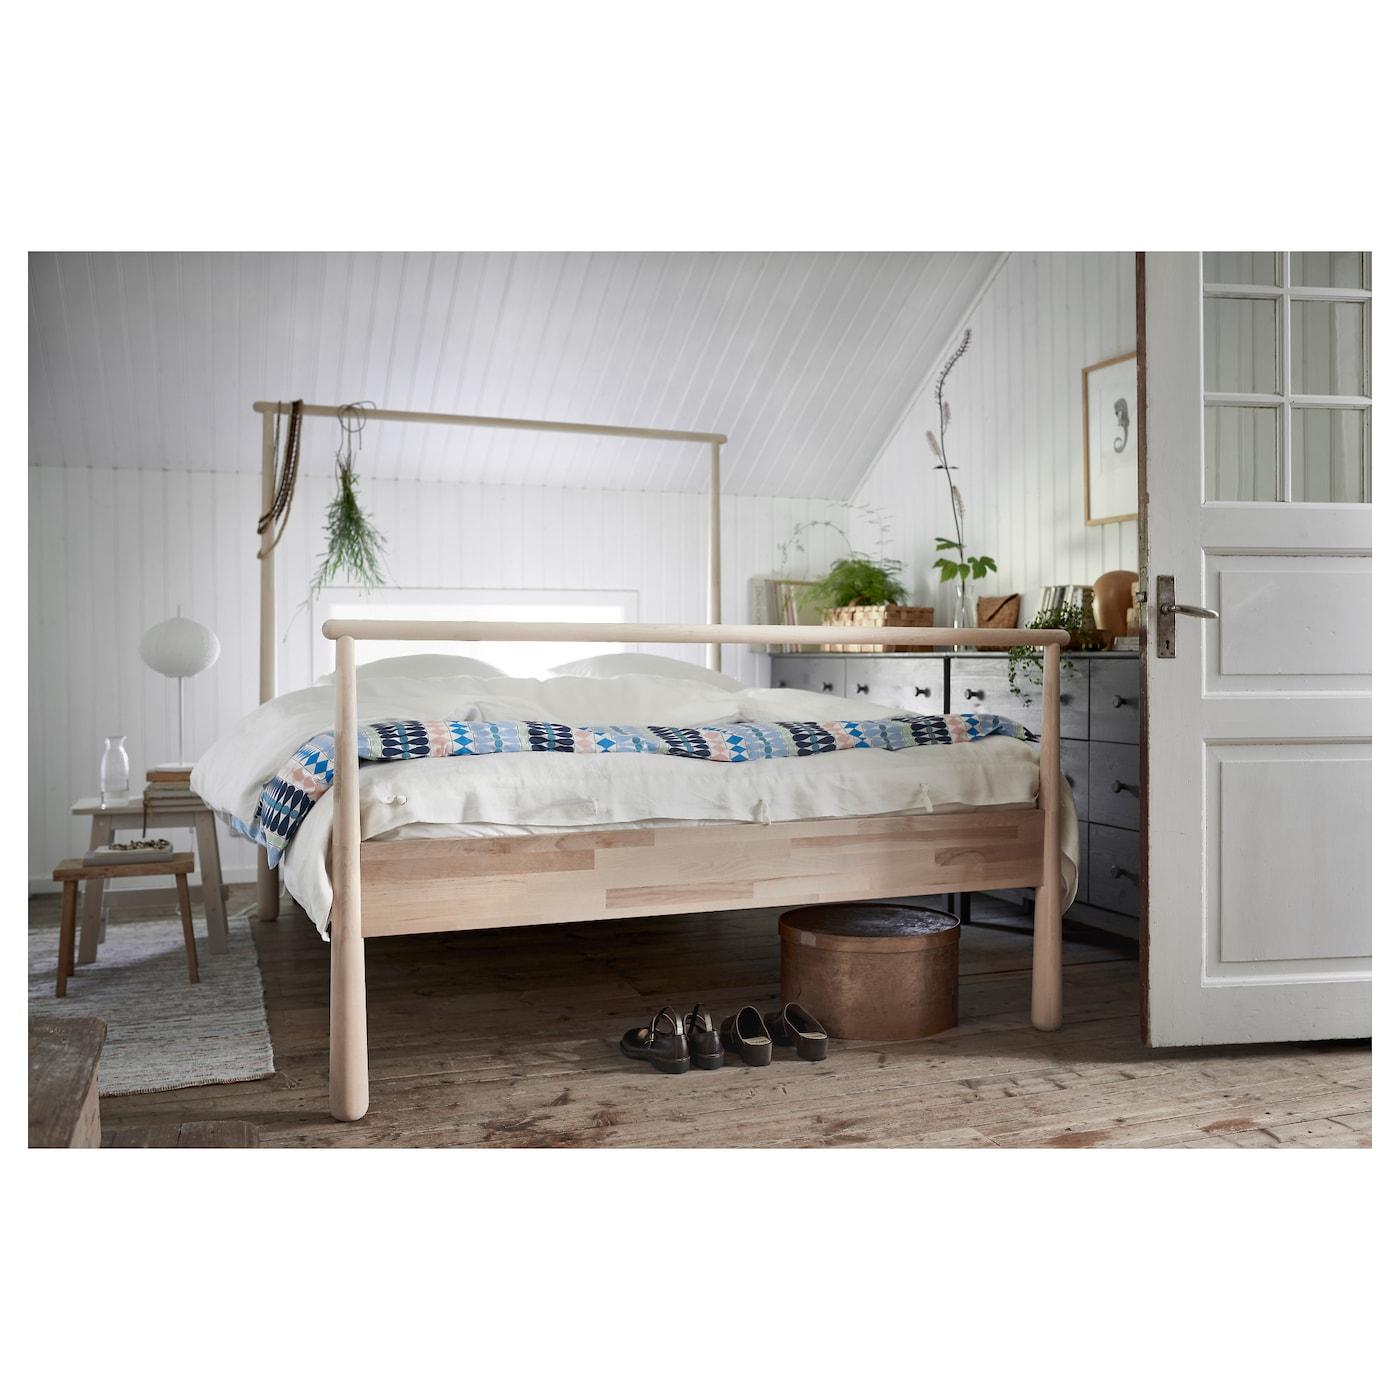 GJ–RA Bed frame Birch luröy Standard Double IKEA